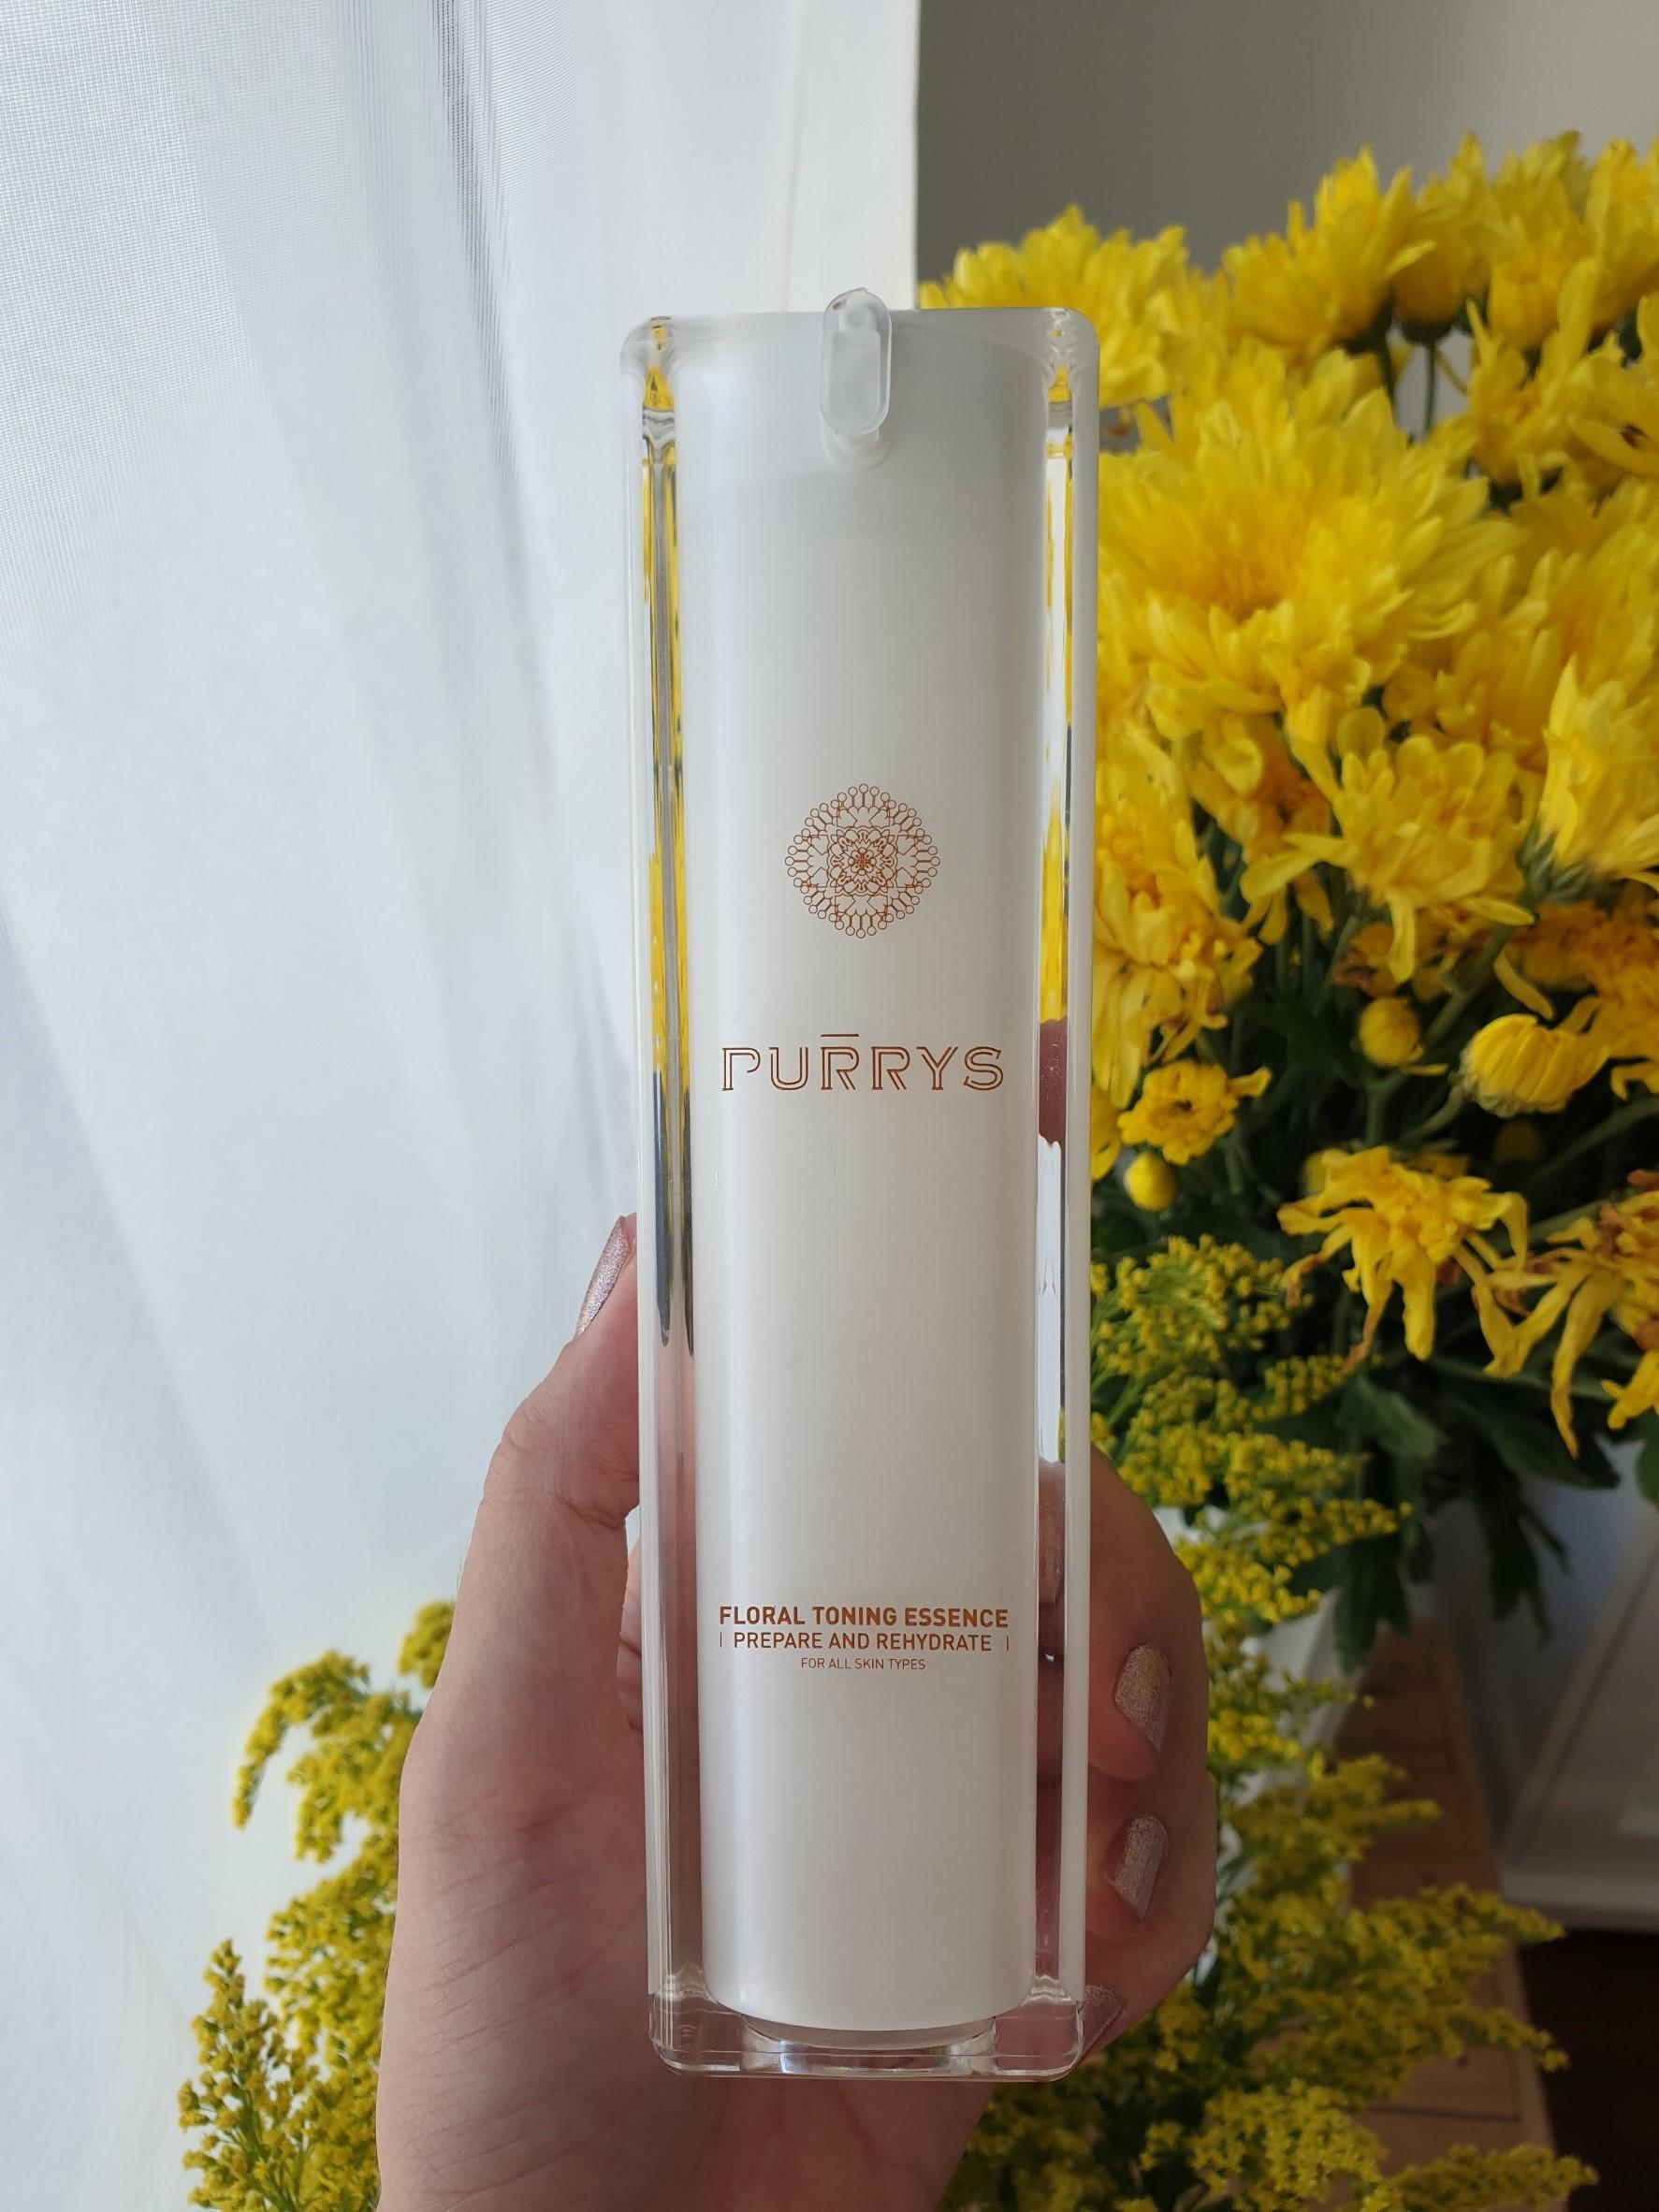 PURRYS Floral Toning Essence (เพอร์ริส ฟลอรัล โทนนิ่ง เอสเซนส์)